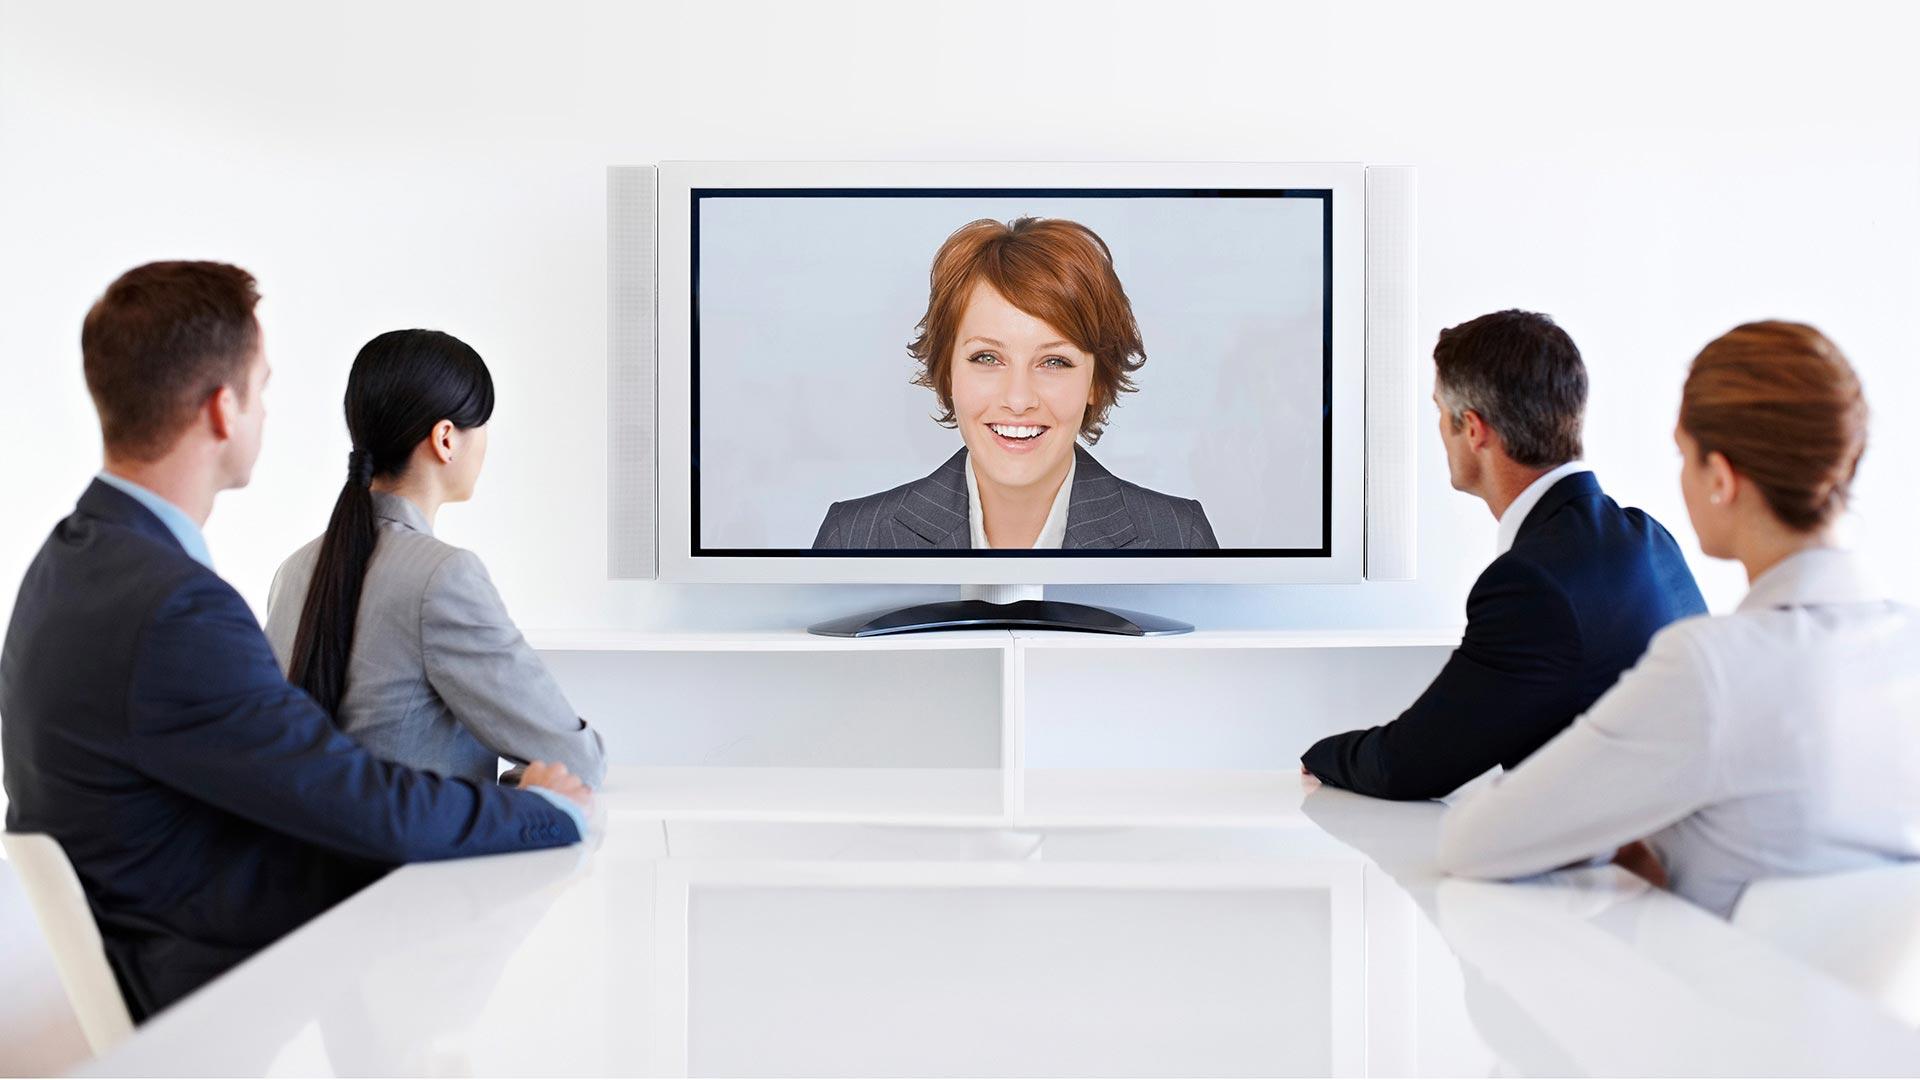 xvideoconferencias-81465102635131.jpg.pagespeed.ic.CYEM-fAzpb